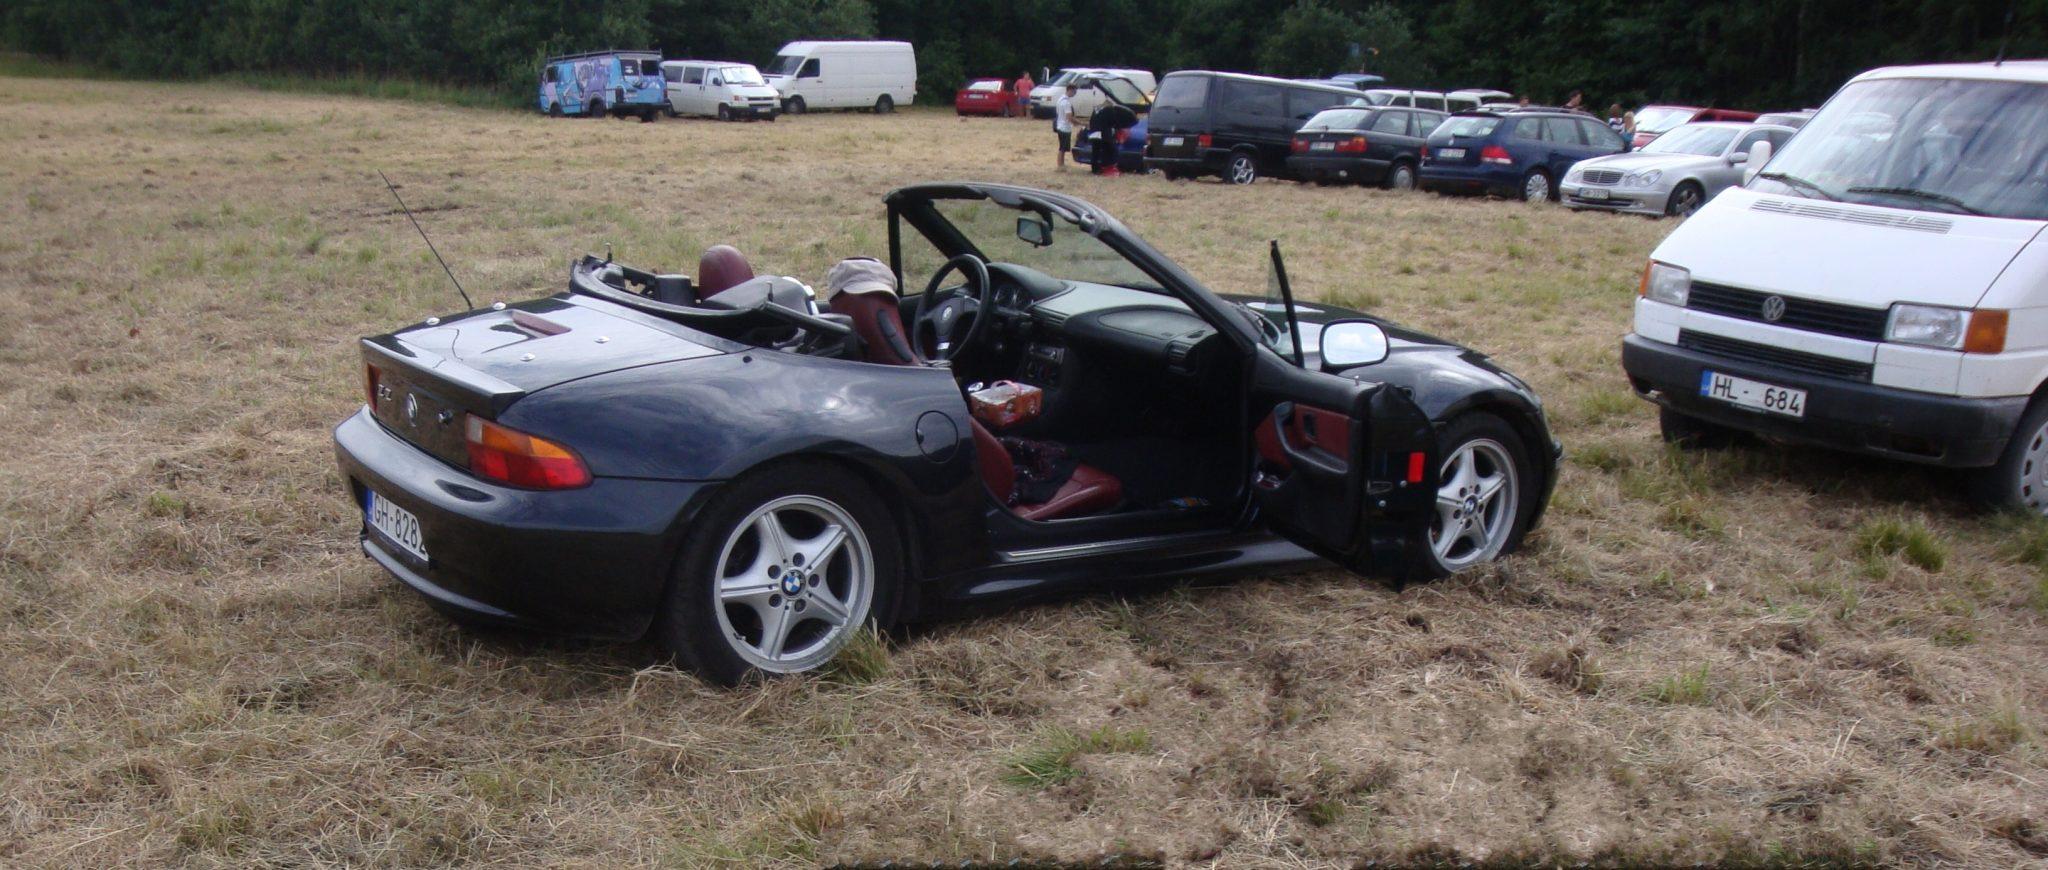 BMW Z3 Positivus 2011 festivāla laikā